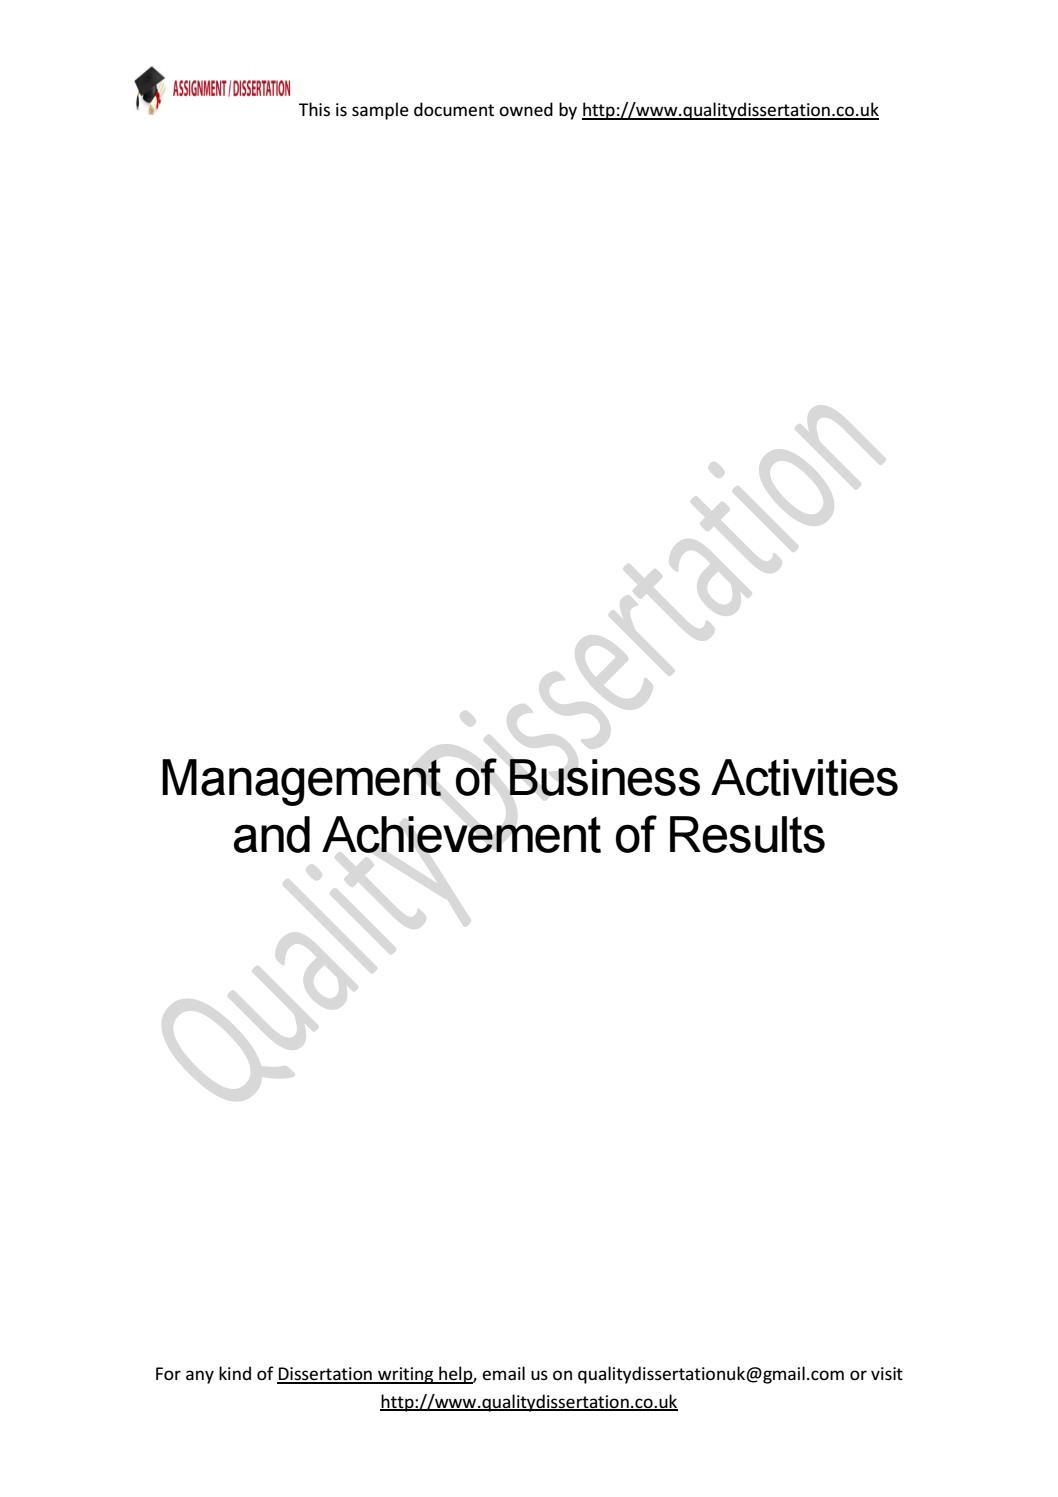 assignment dissertation 总的来说,dissertation和essay的主要区别在于是否有完整的研究方法和数据分析等实证过程。 专业assignment, essays, report, coursework, 辅导 7 人赞同了该回答.